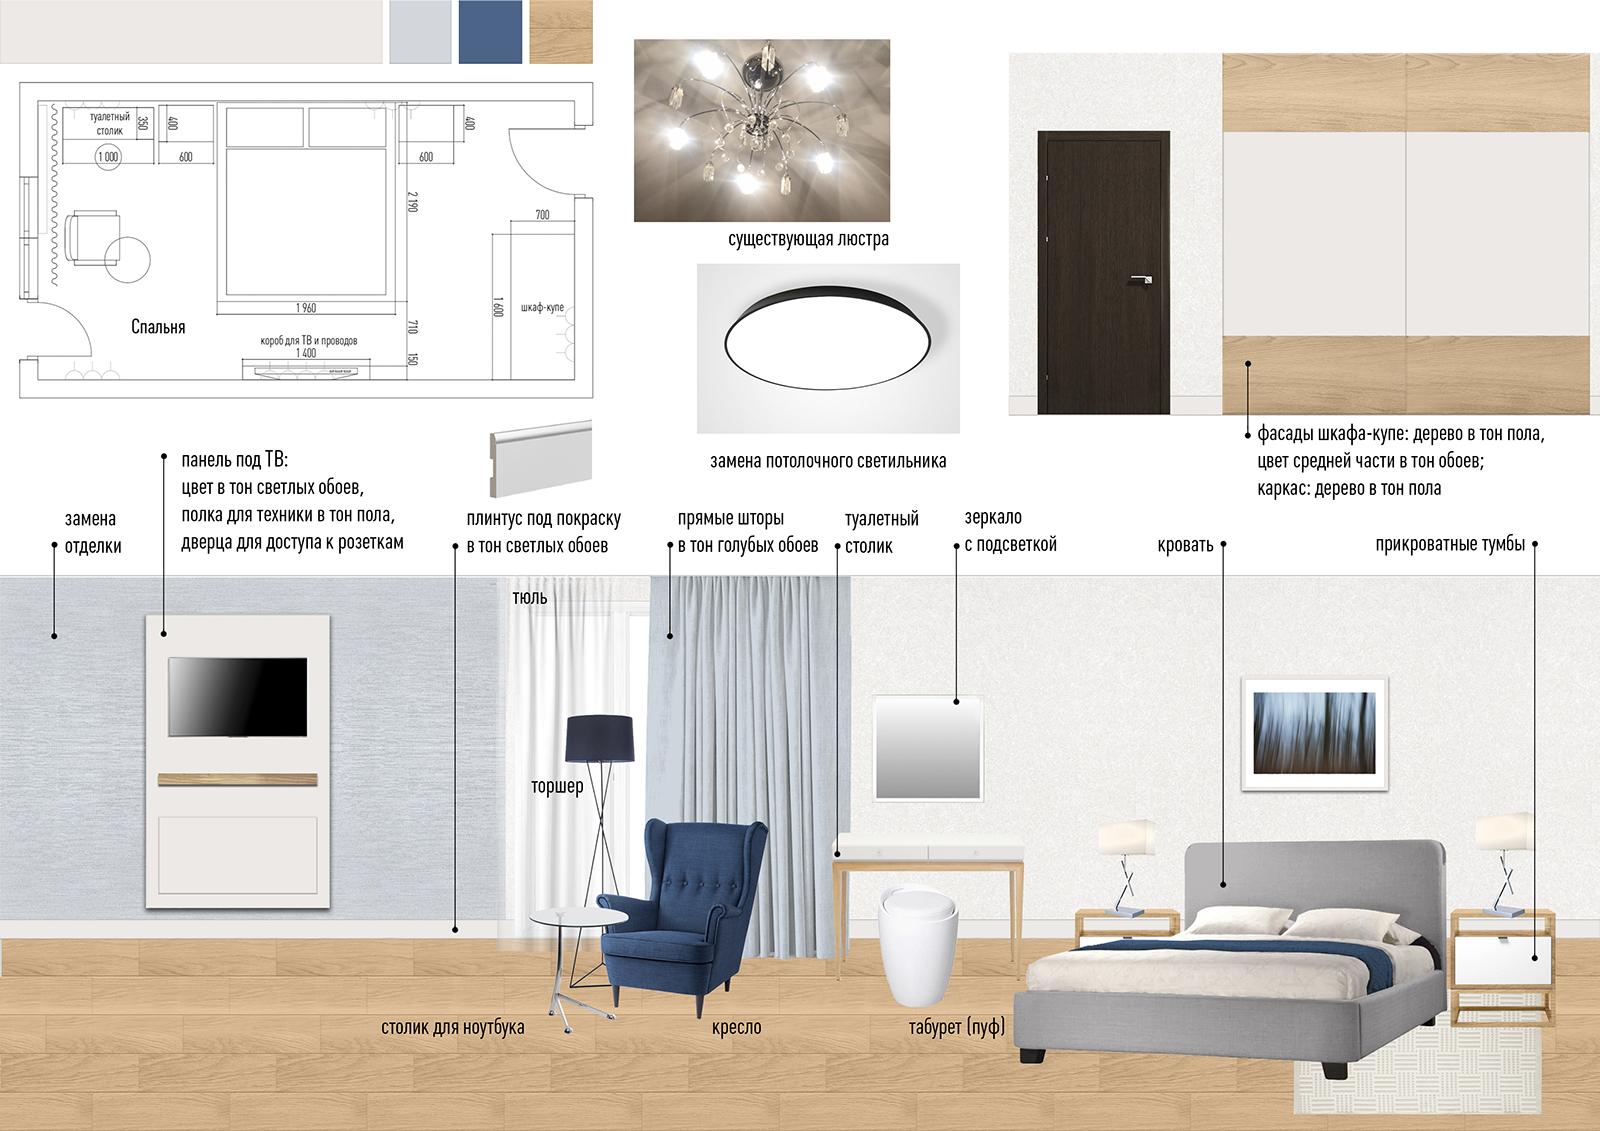 Проект декорирования спальни